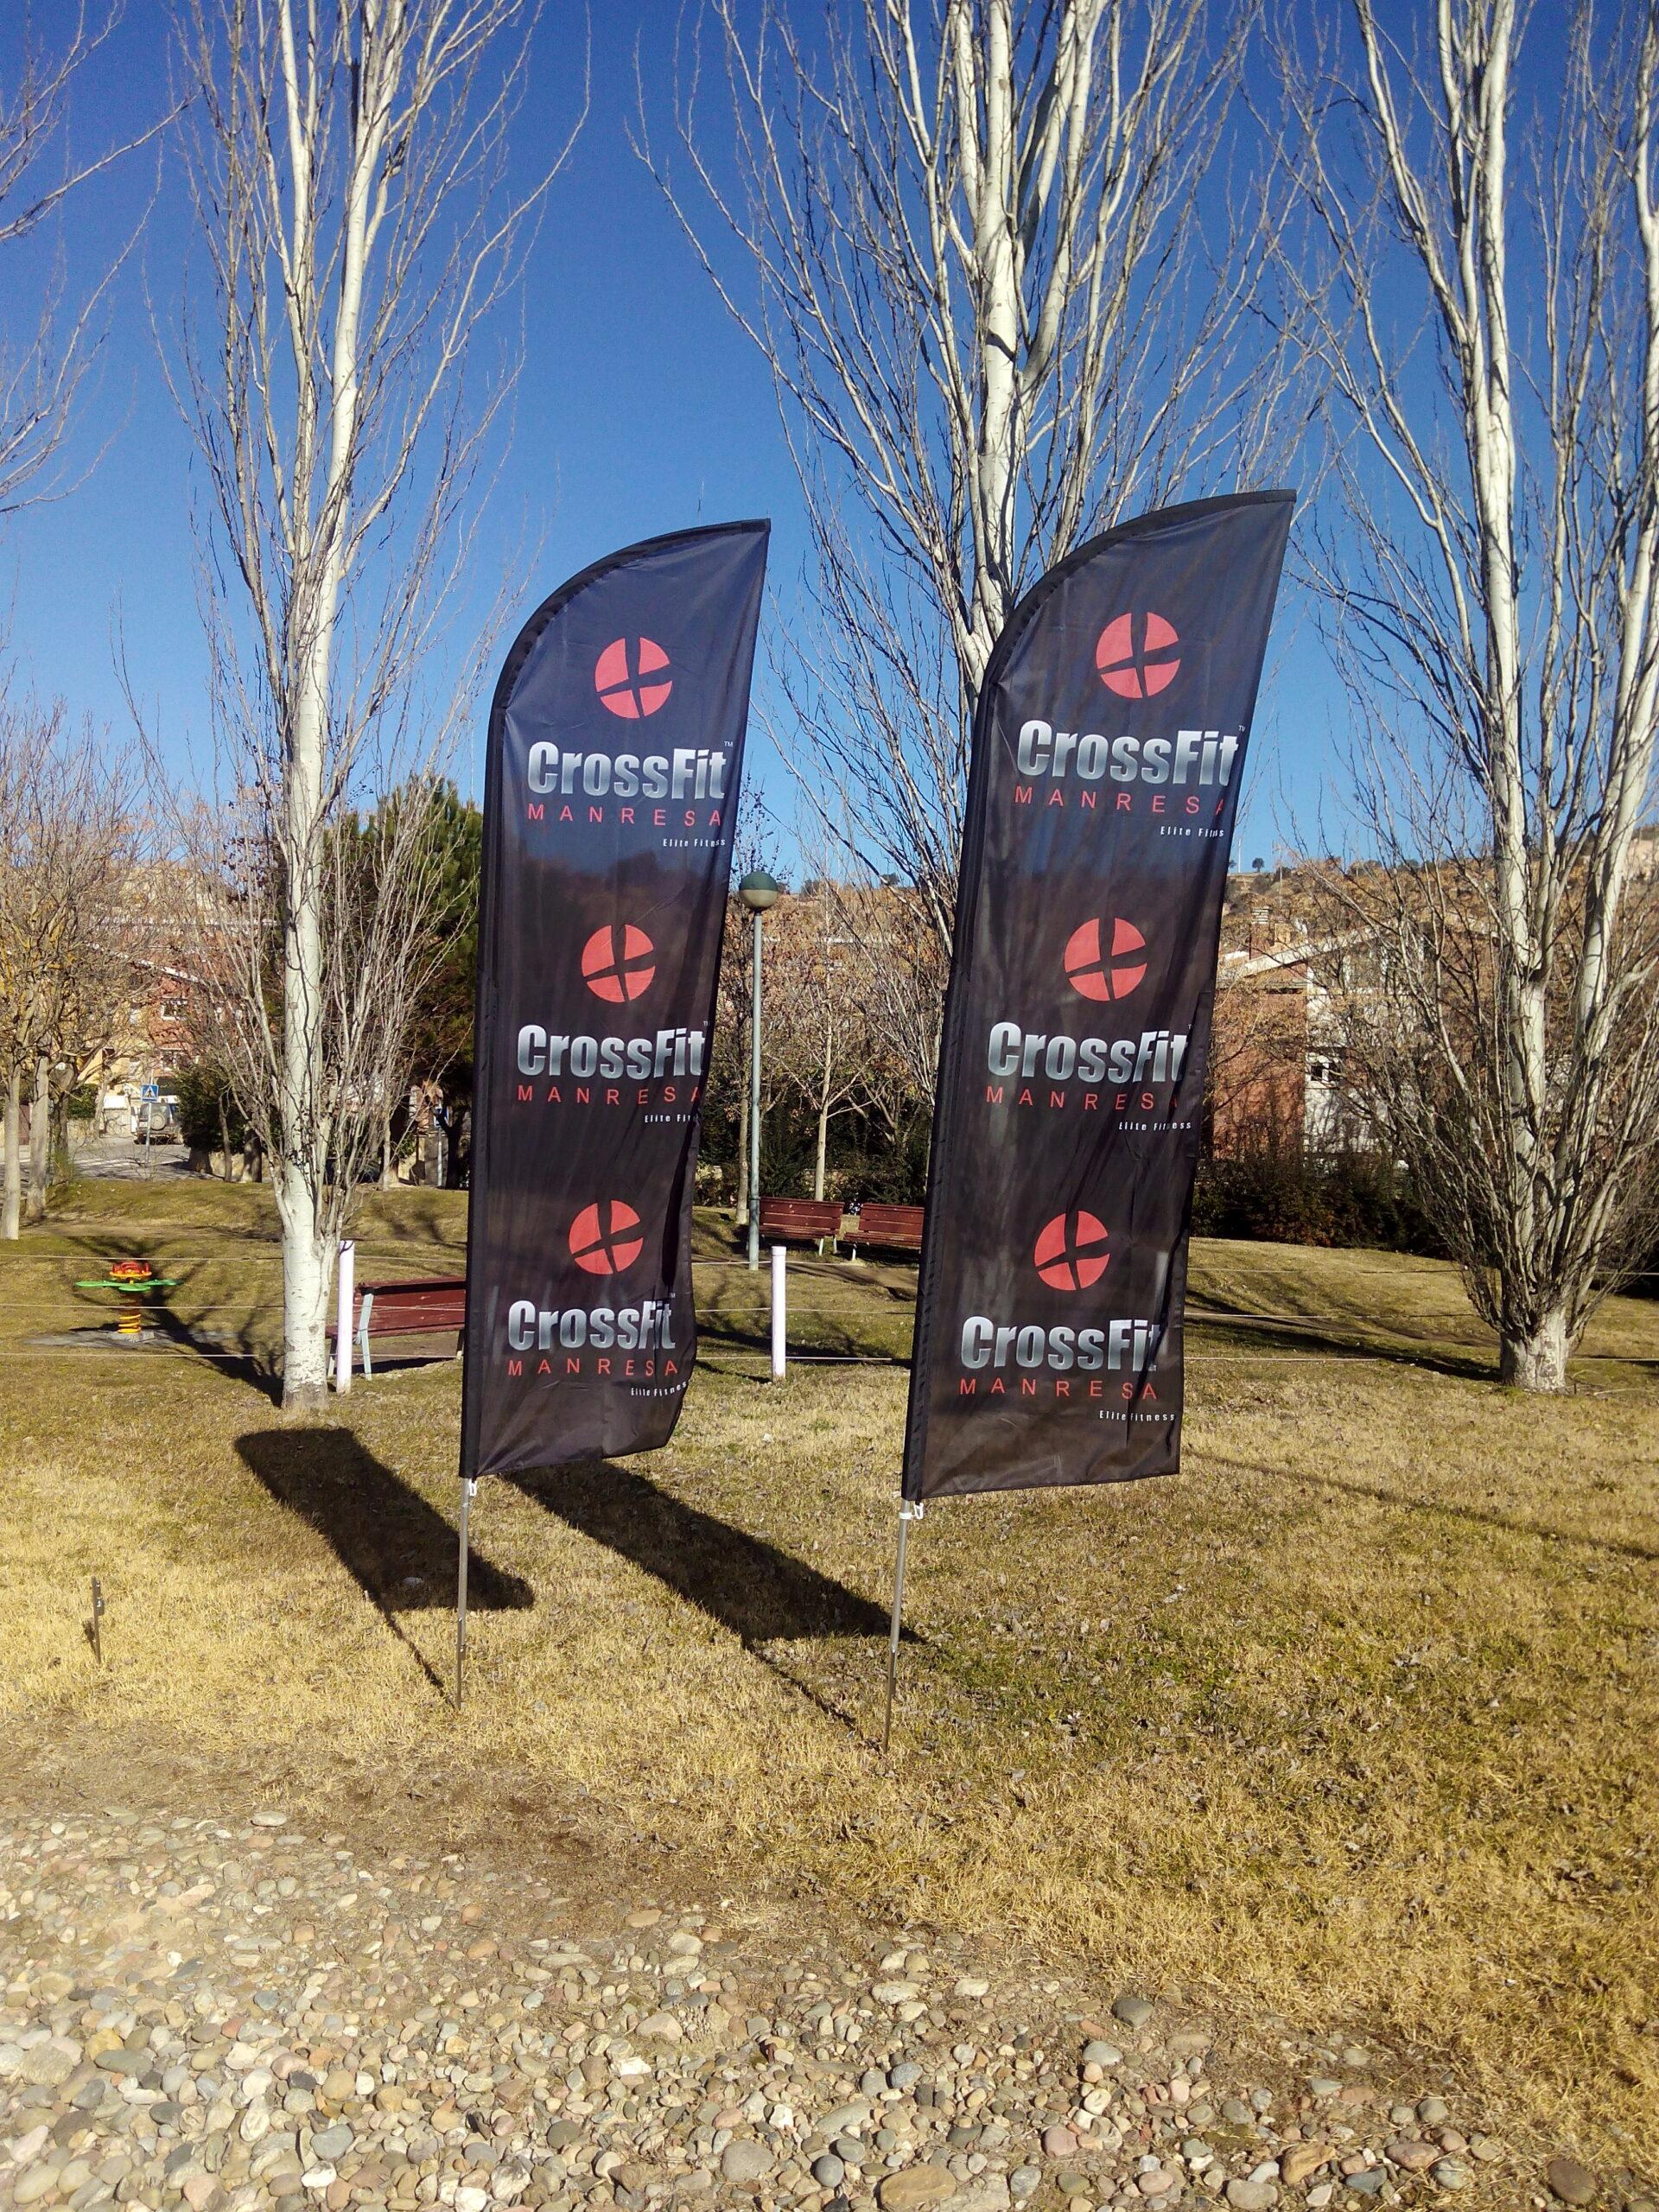 Banderas Wing Banner CrossFit Manresa Y Vela Club Manresa